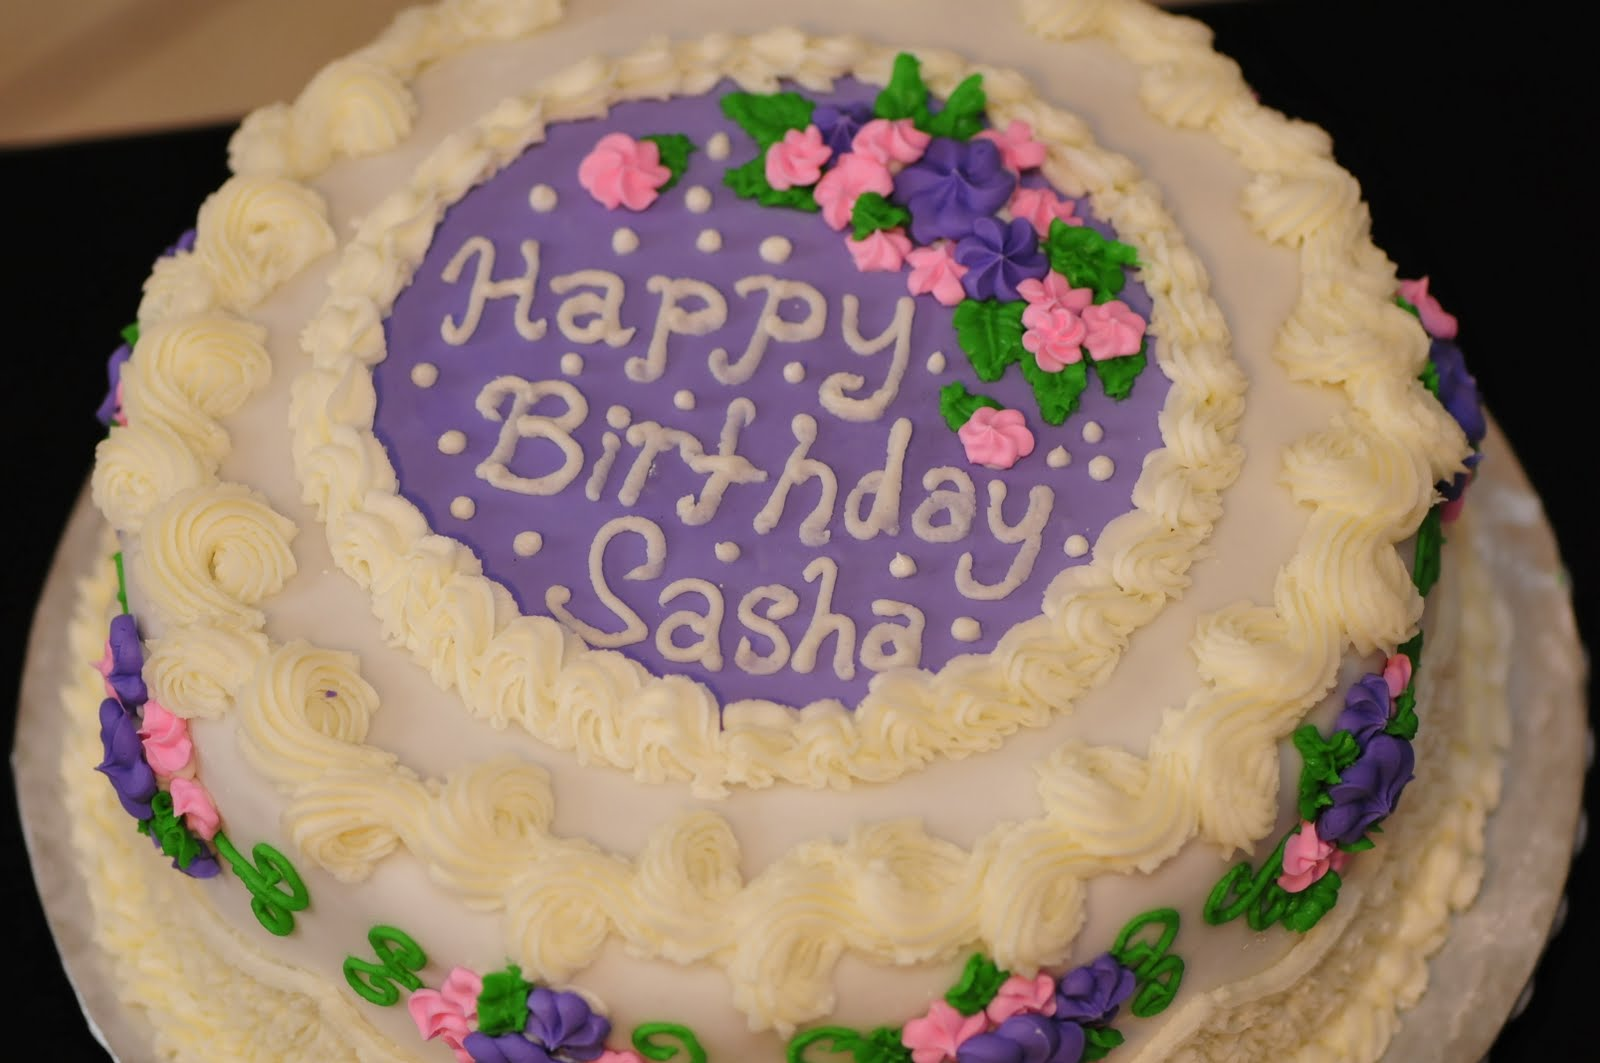 Happy Birthday Sasha Cake Brithday Cake